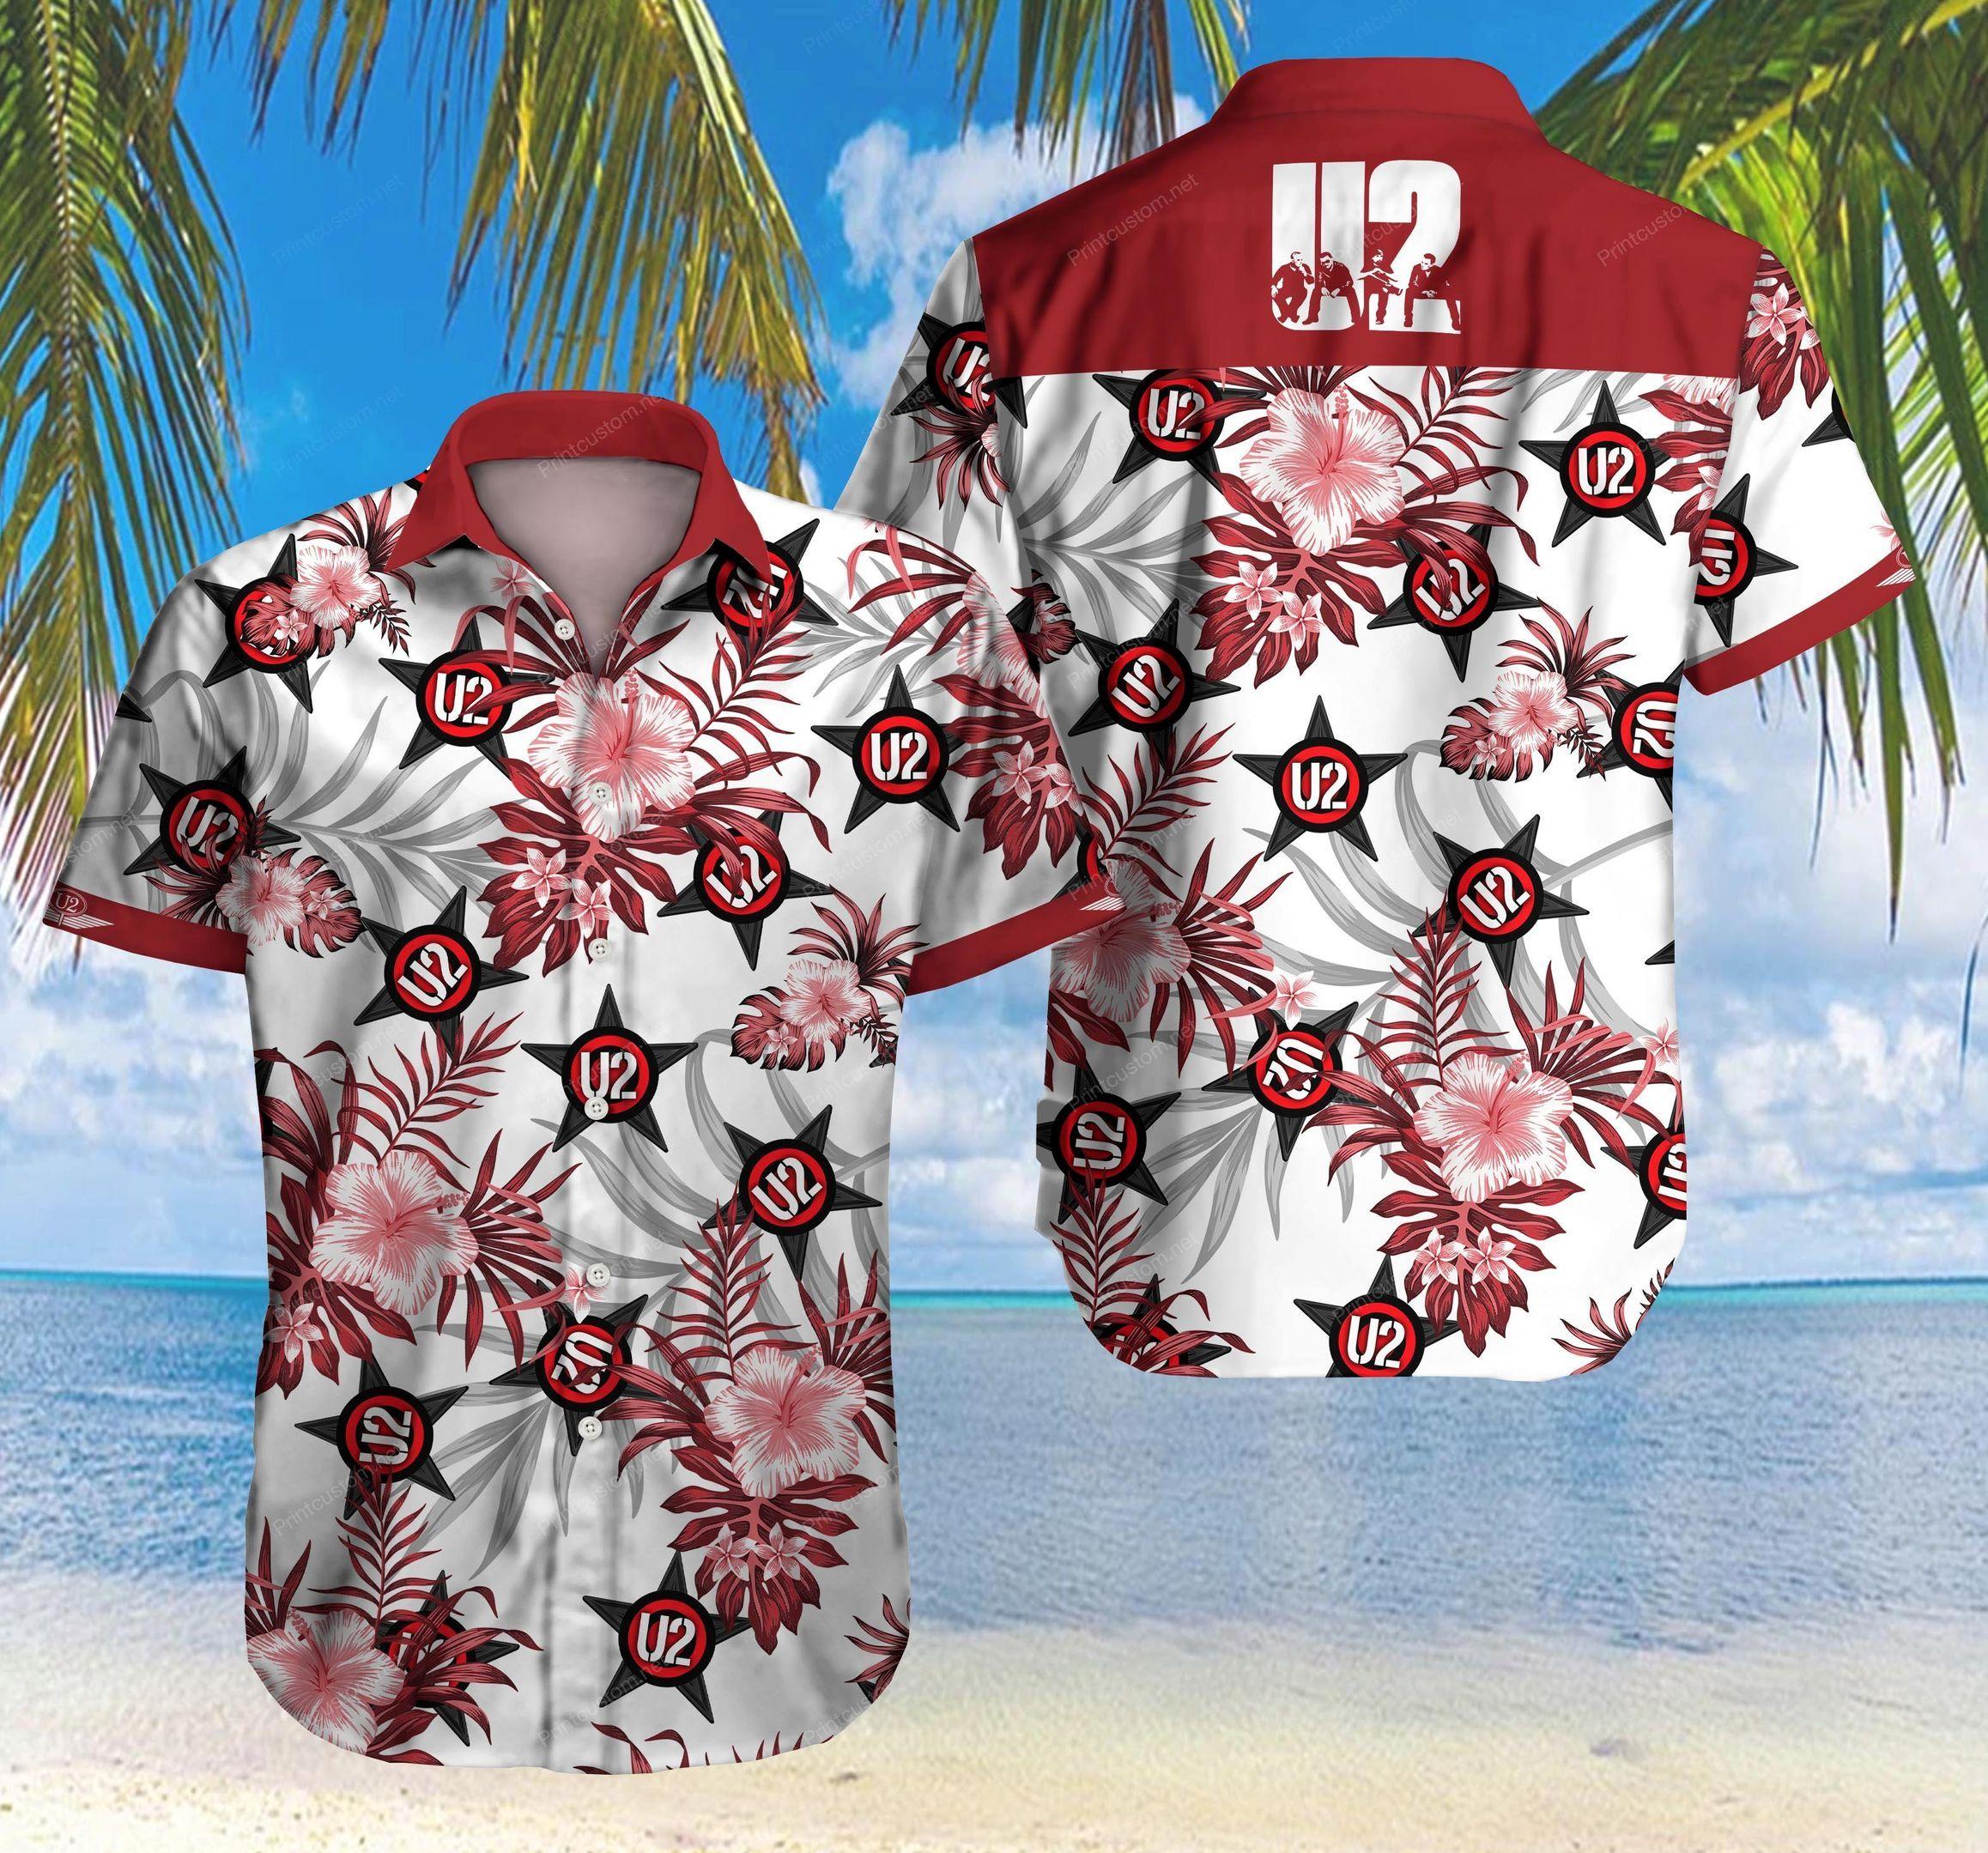 U2 rock band Hawaiian Shirt Summer Shirt